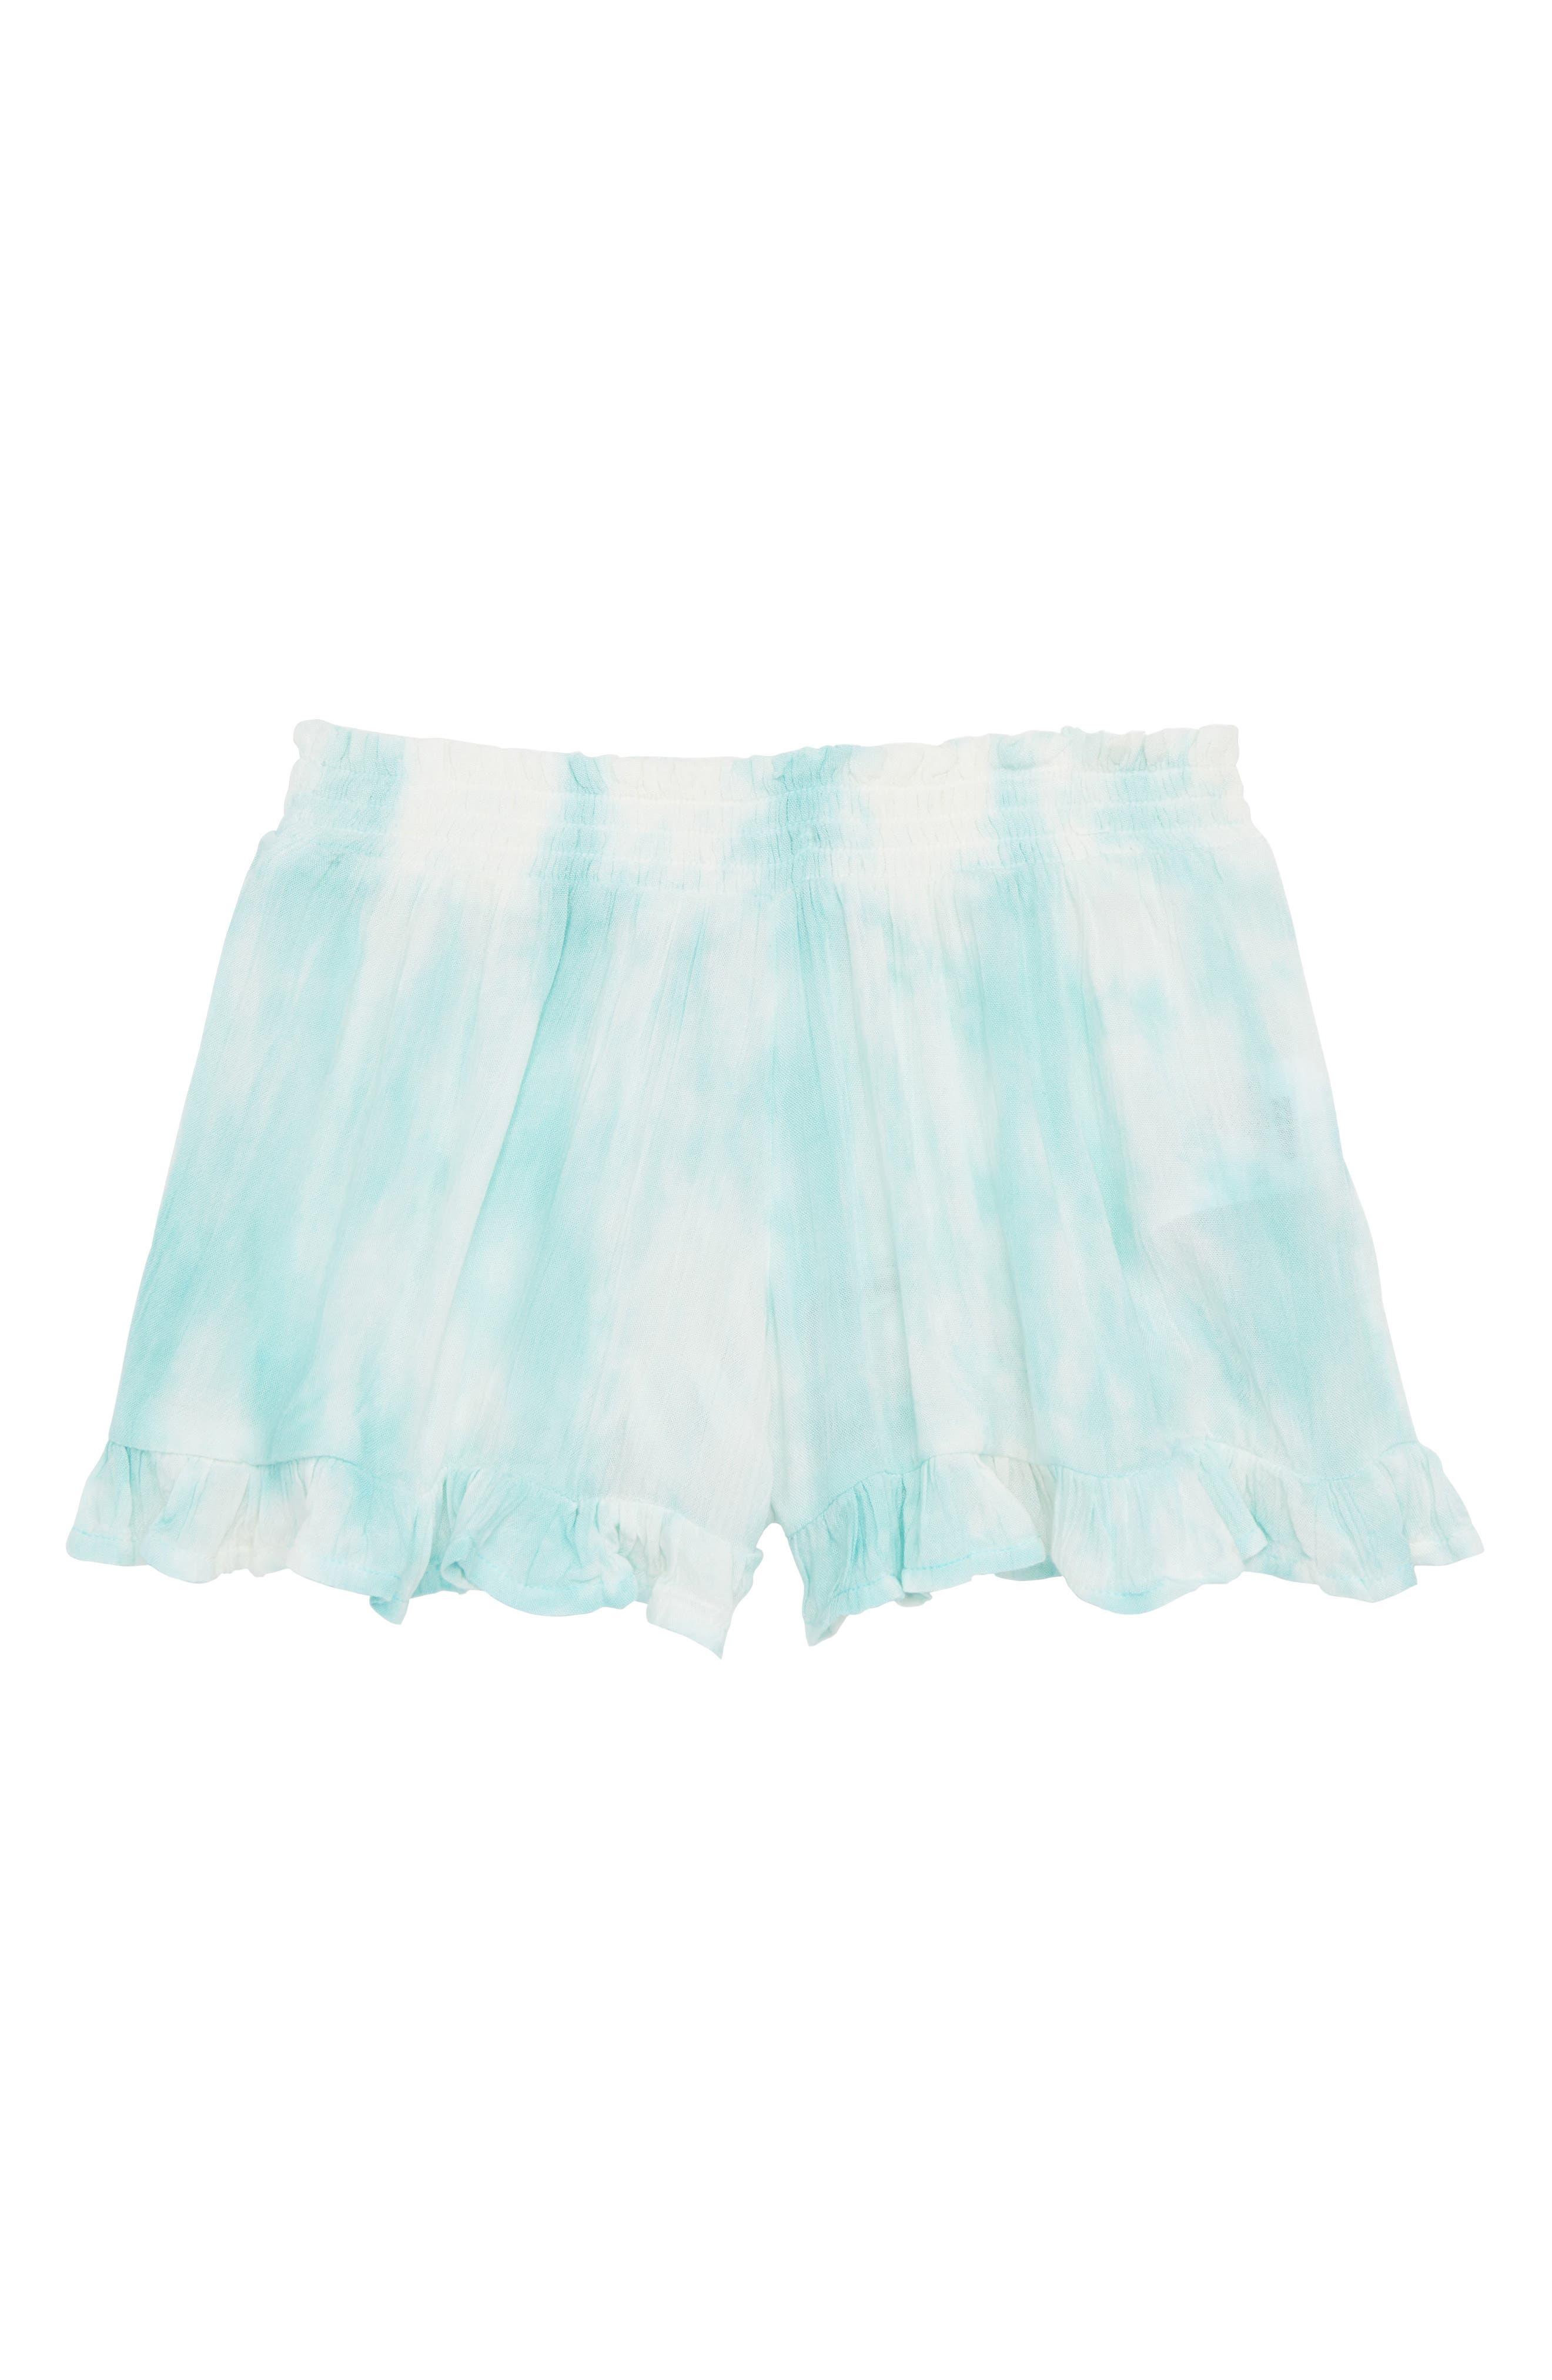 Wild Wave Shorts,                         Main,                         color, 414